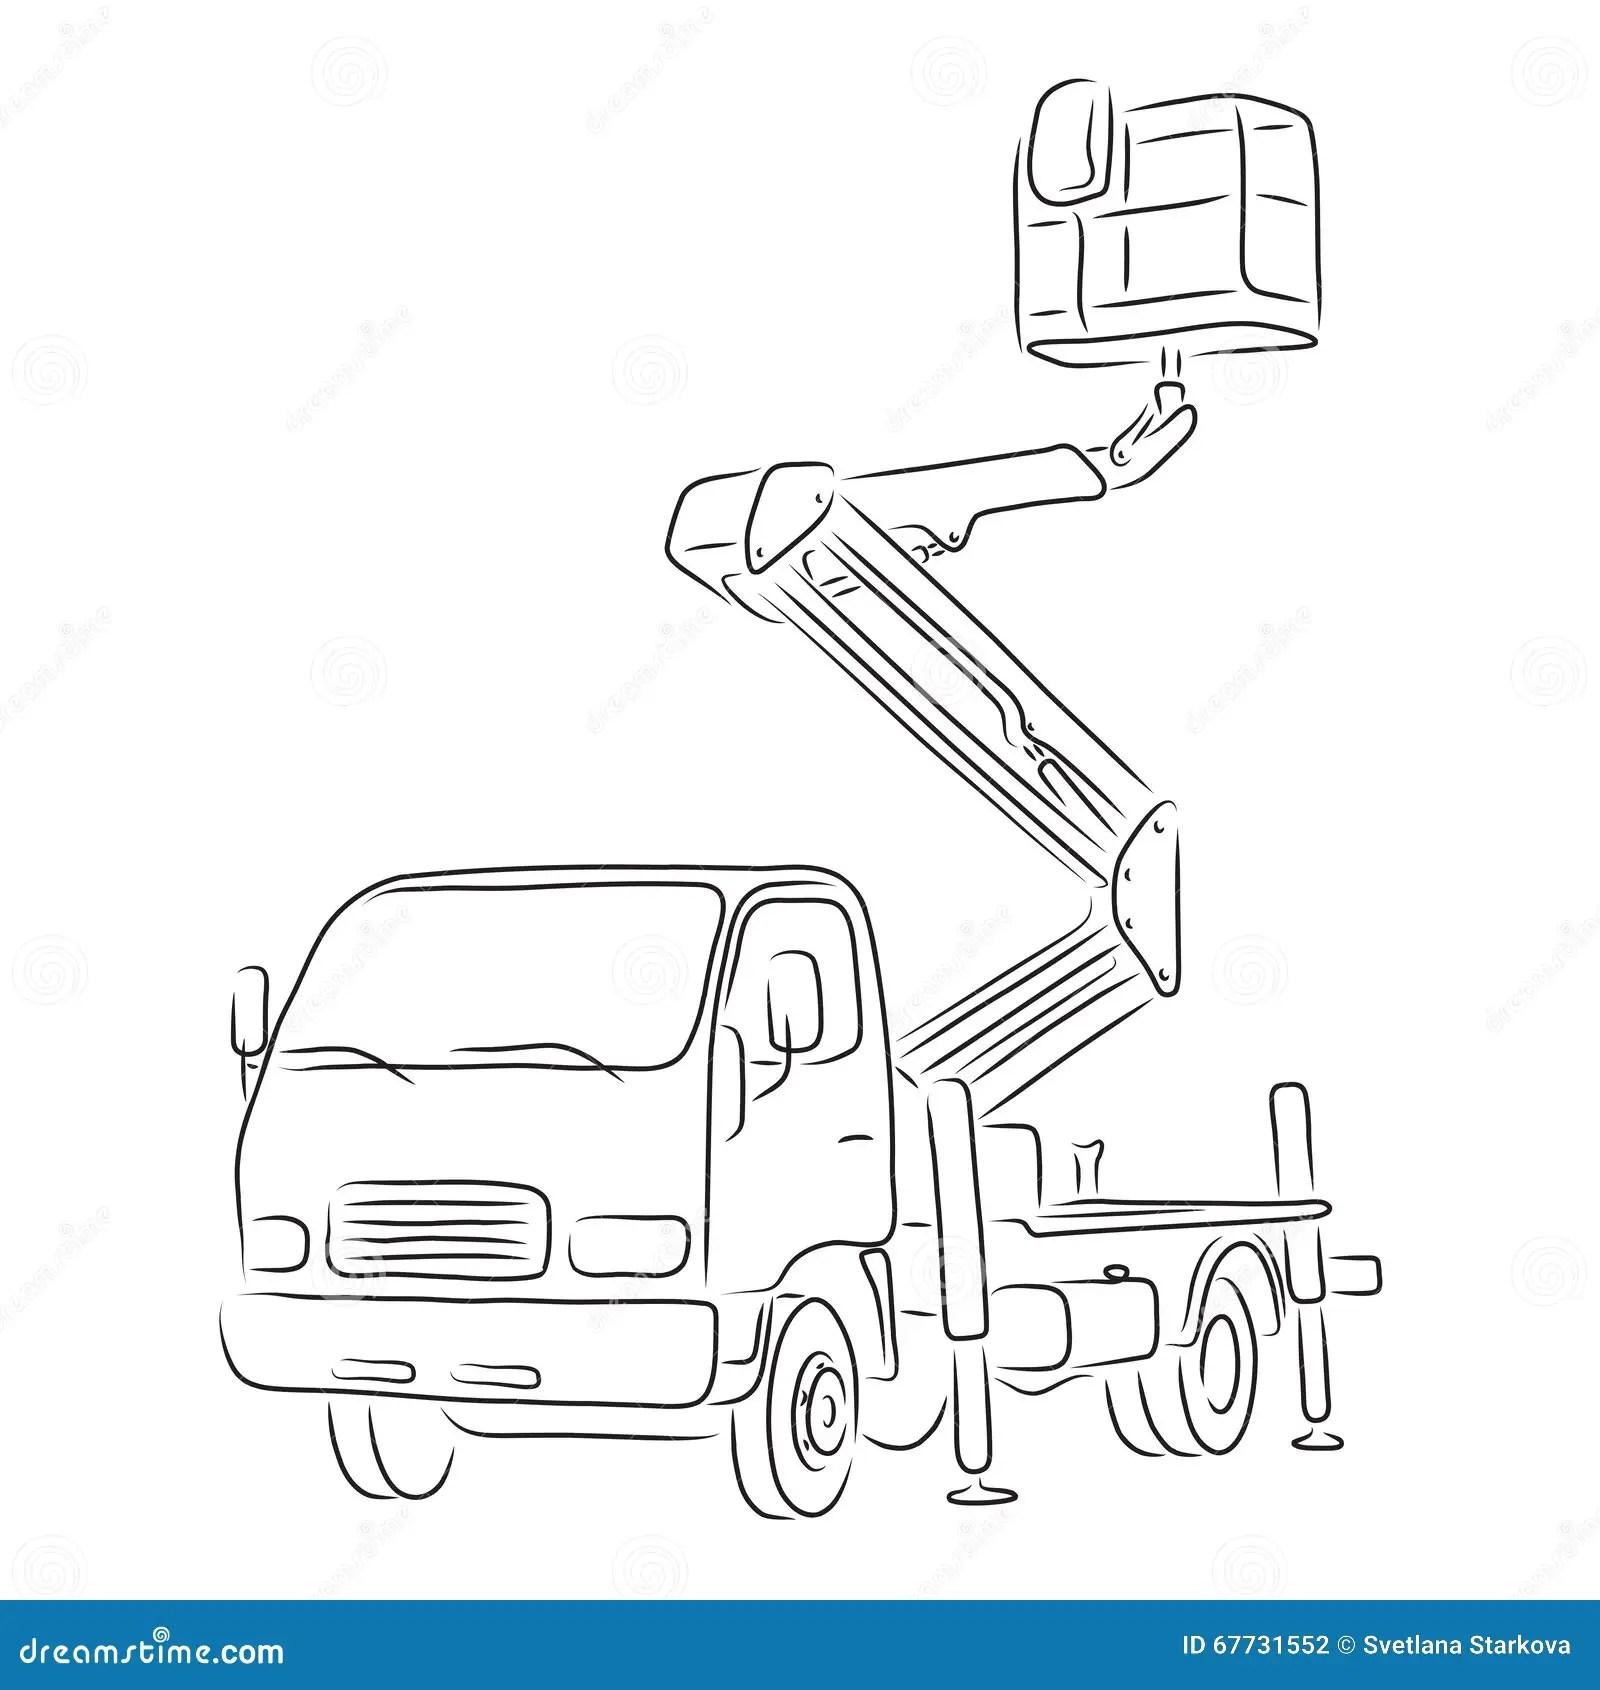 Outline Of Bucket Truck Vector Illustration Stock Vector